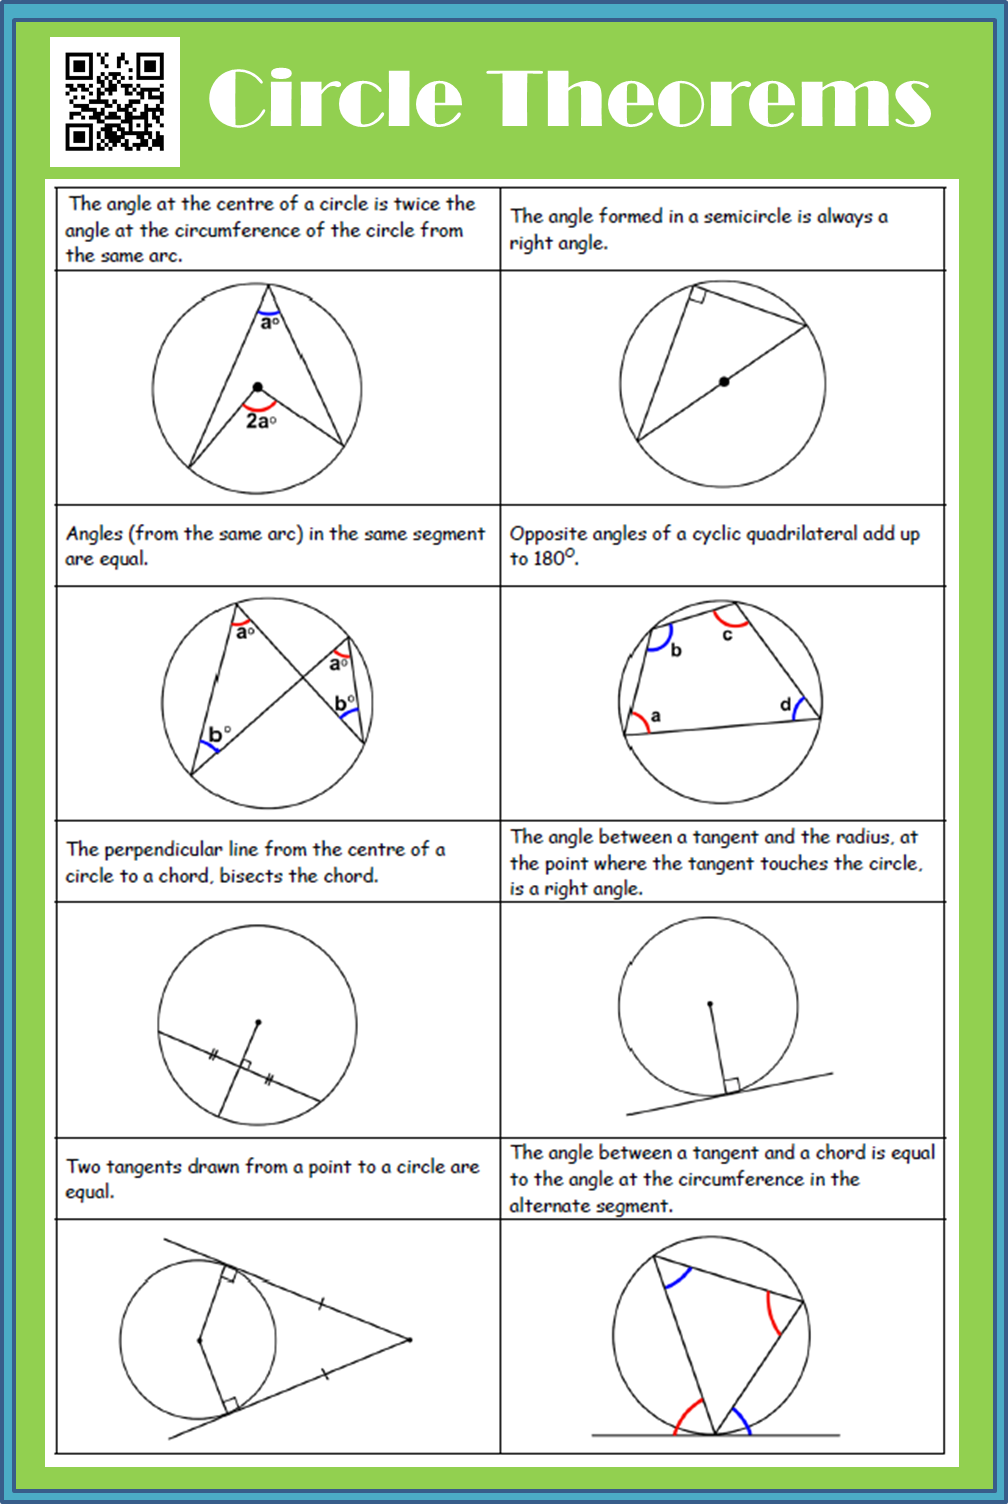 Circle Theorems | Maths Revision | Math | Gcse maths revision, Gcse